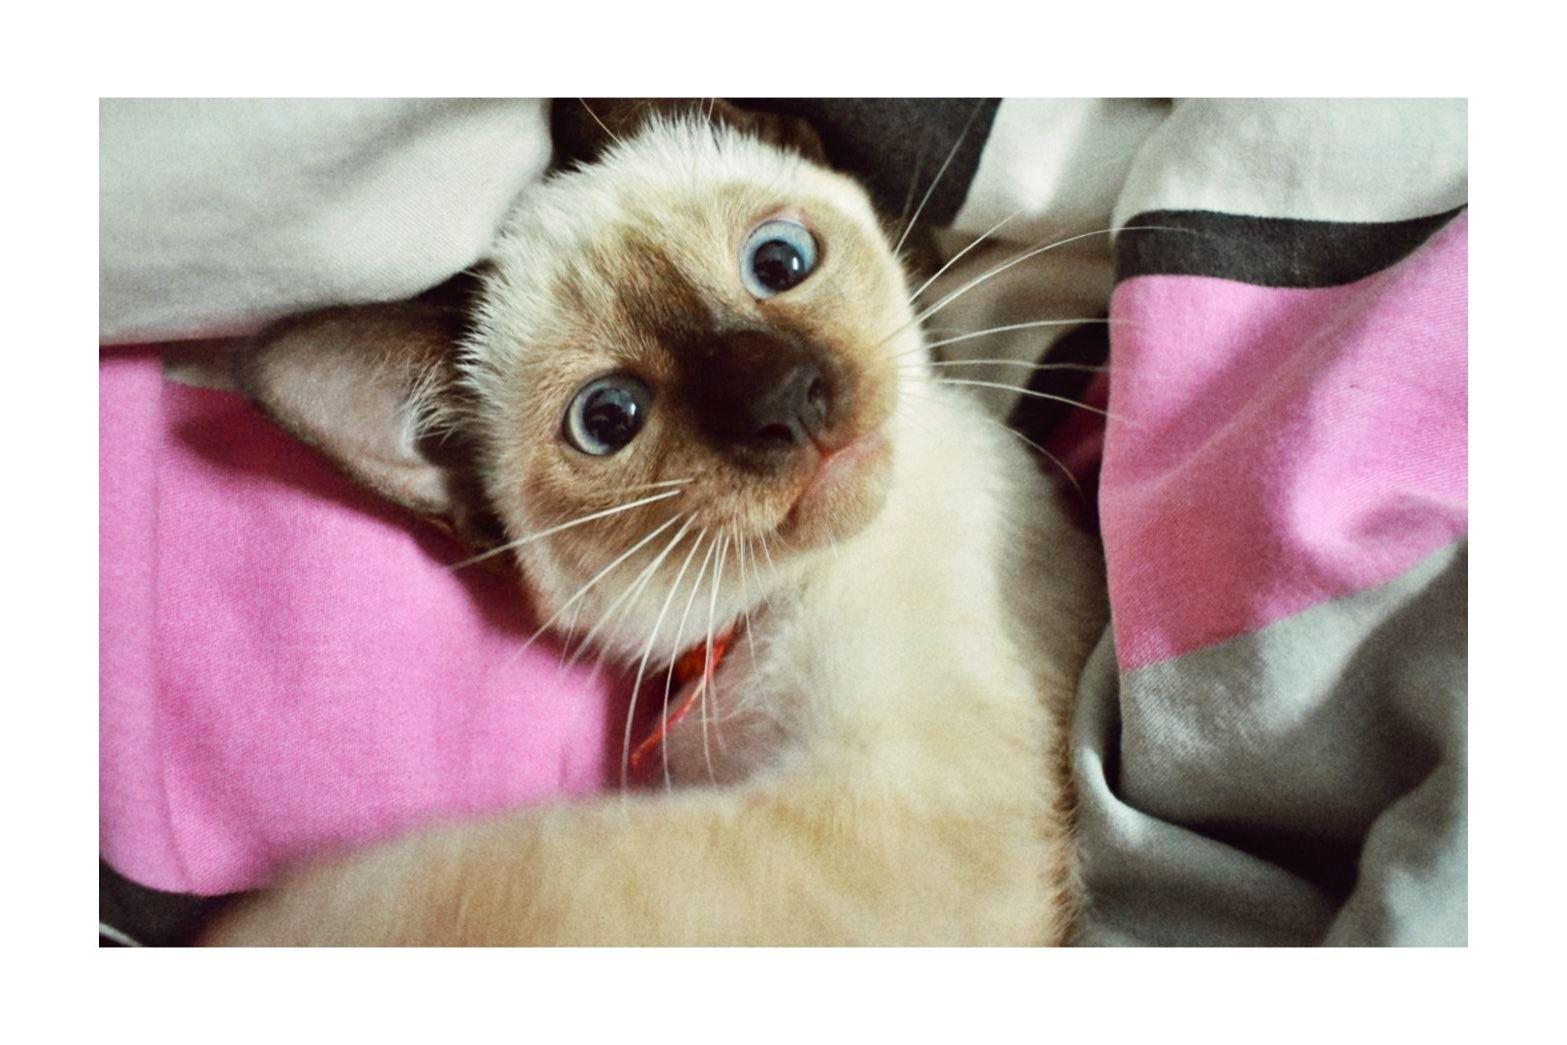 Siamcat Siamcats Cats Kitty ว เช ยรมาศ แมวไทย แมวว เช ยรมาศ แมวน อย แมว ไทย